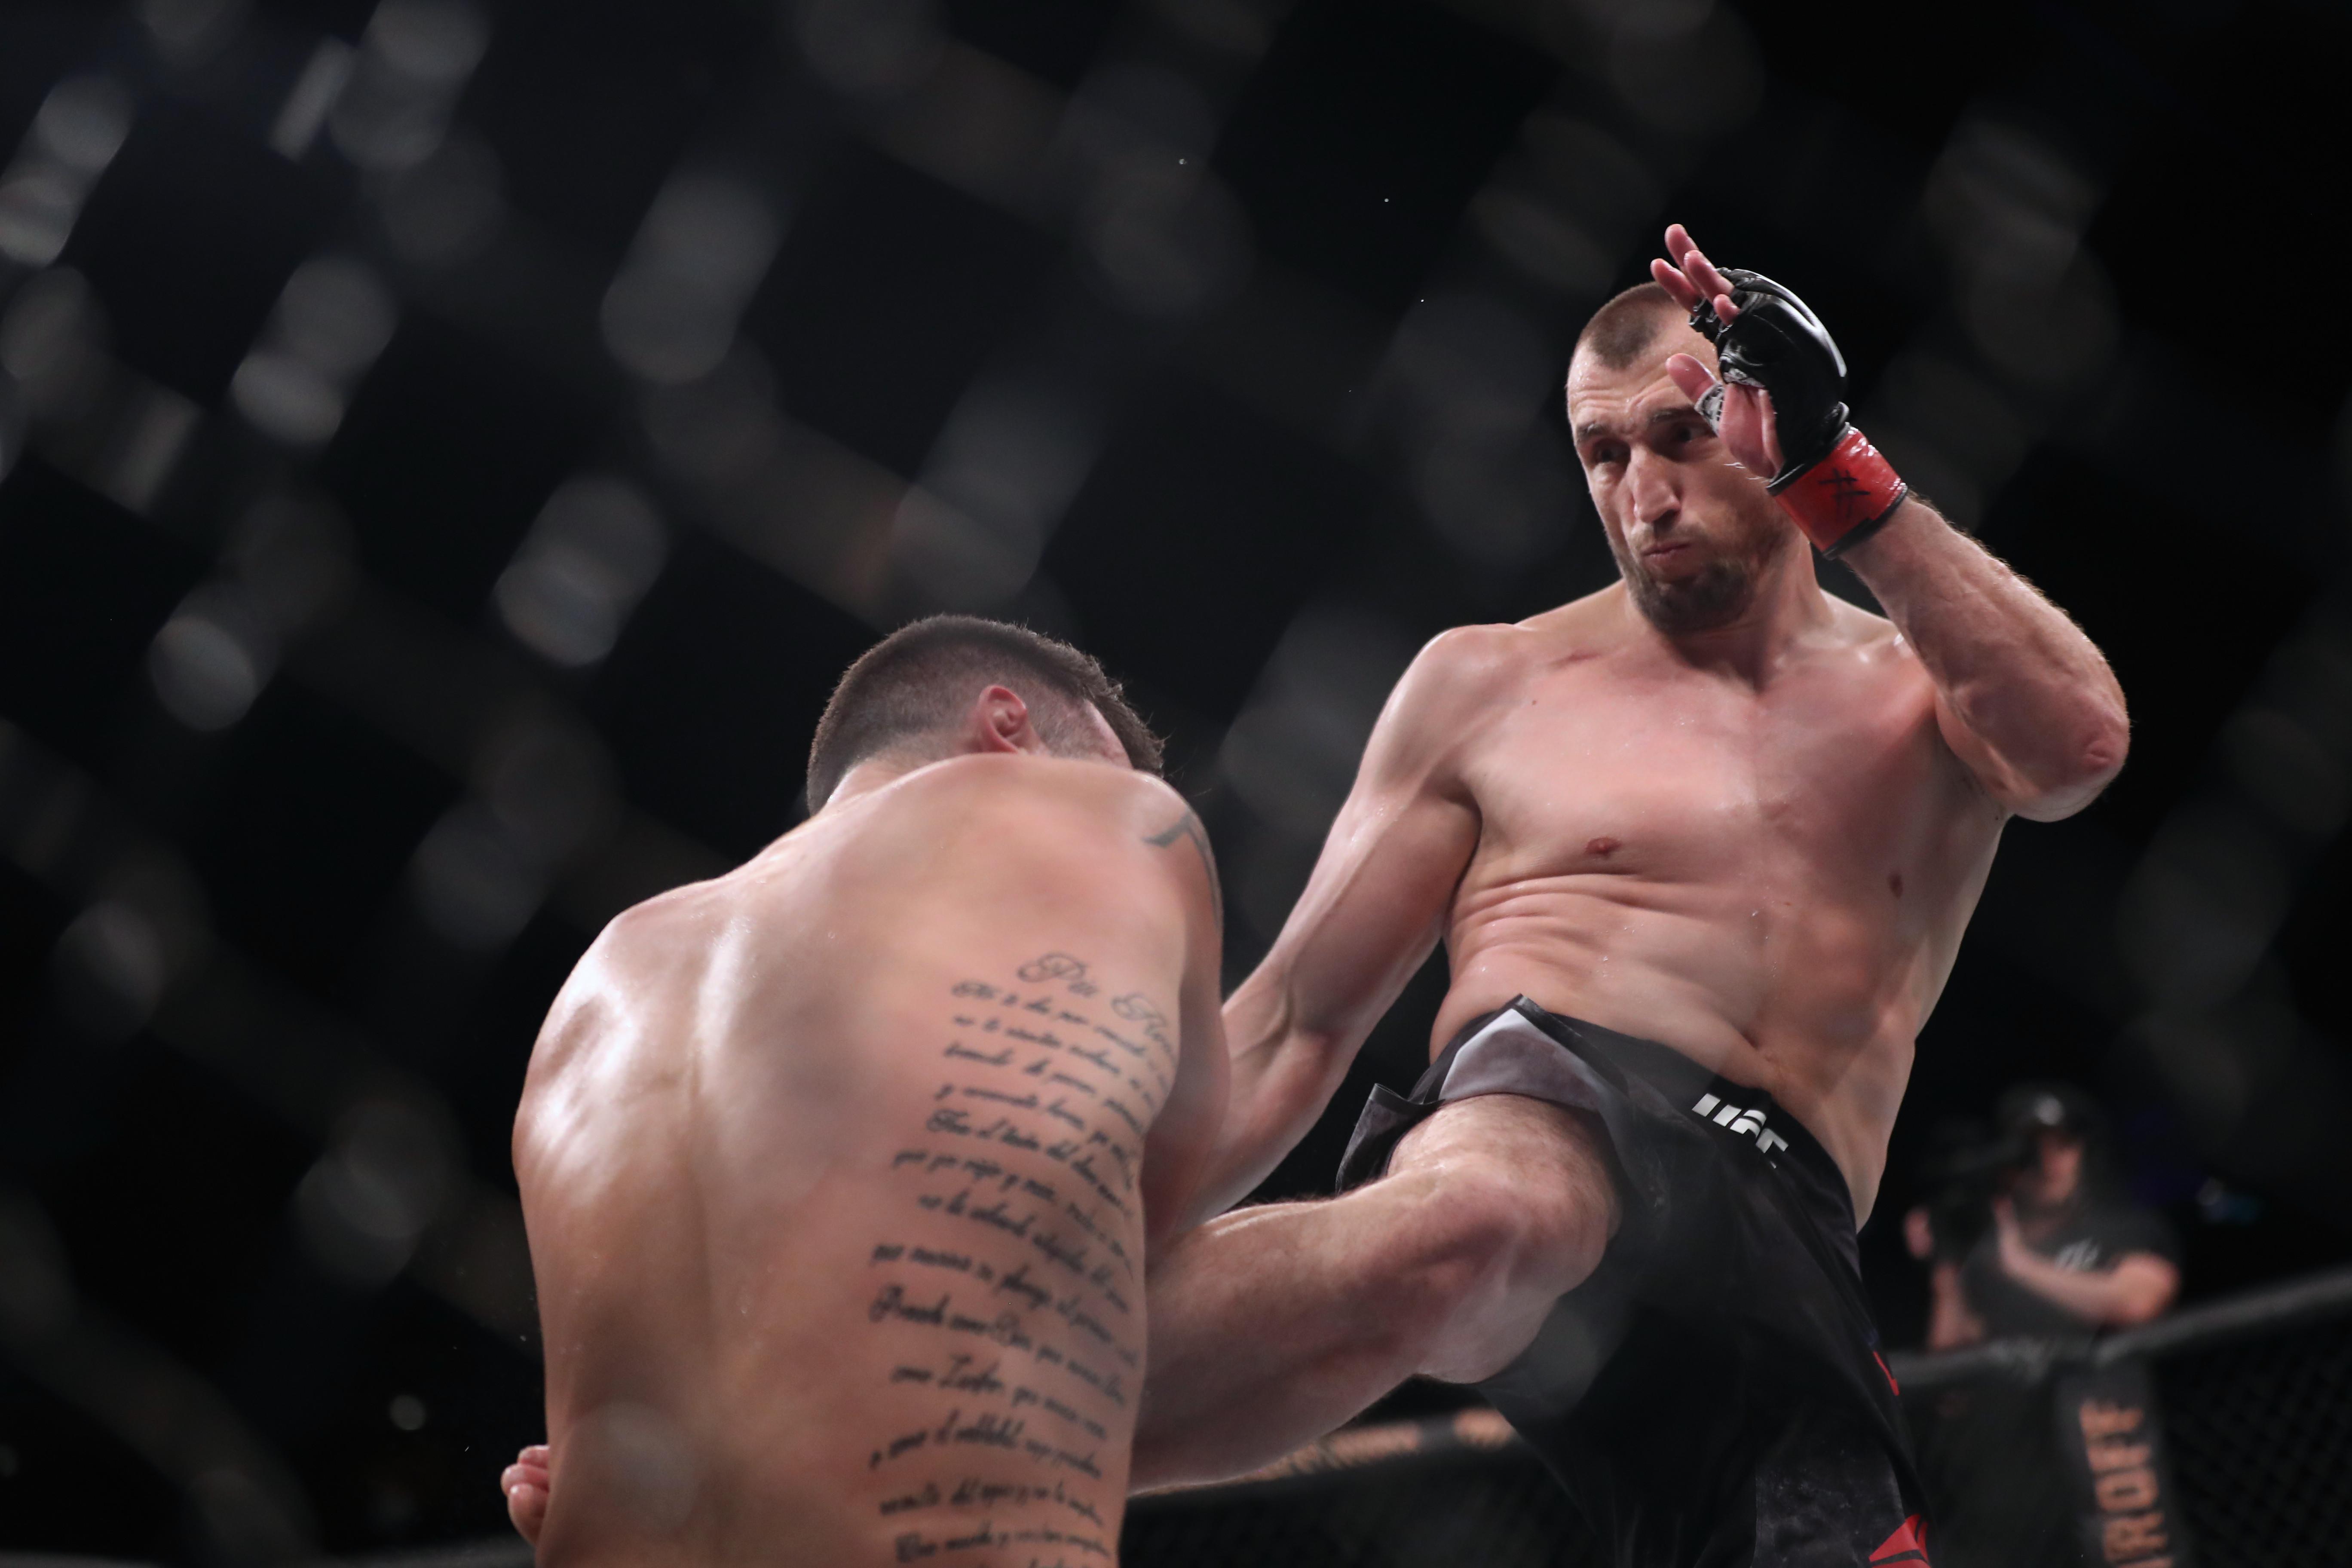 Muslim Salikhov (red gloves) fights Laureano Staropoli (blue gloves) during UFC Fight Night at Singapore Indoor Arena in October 2019.